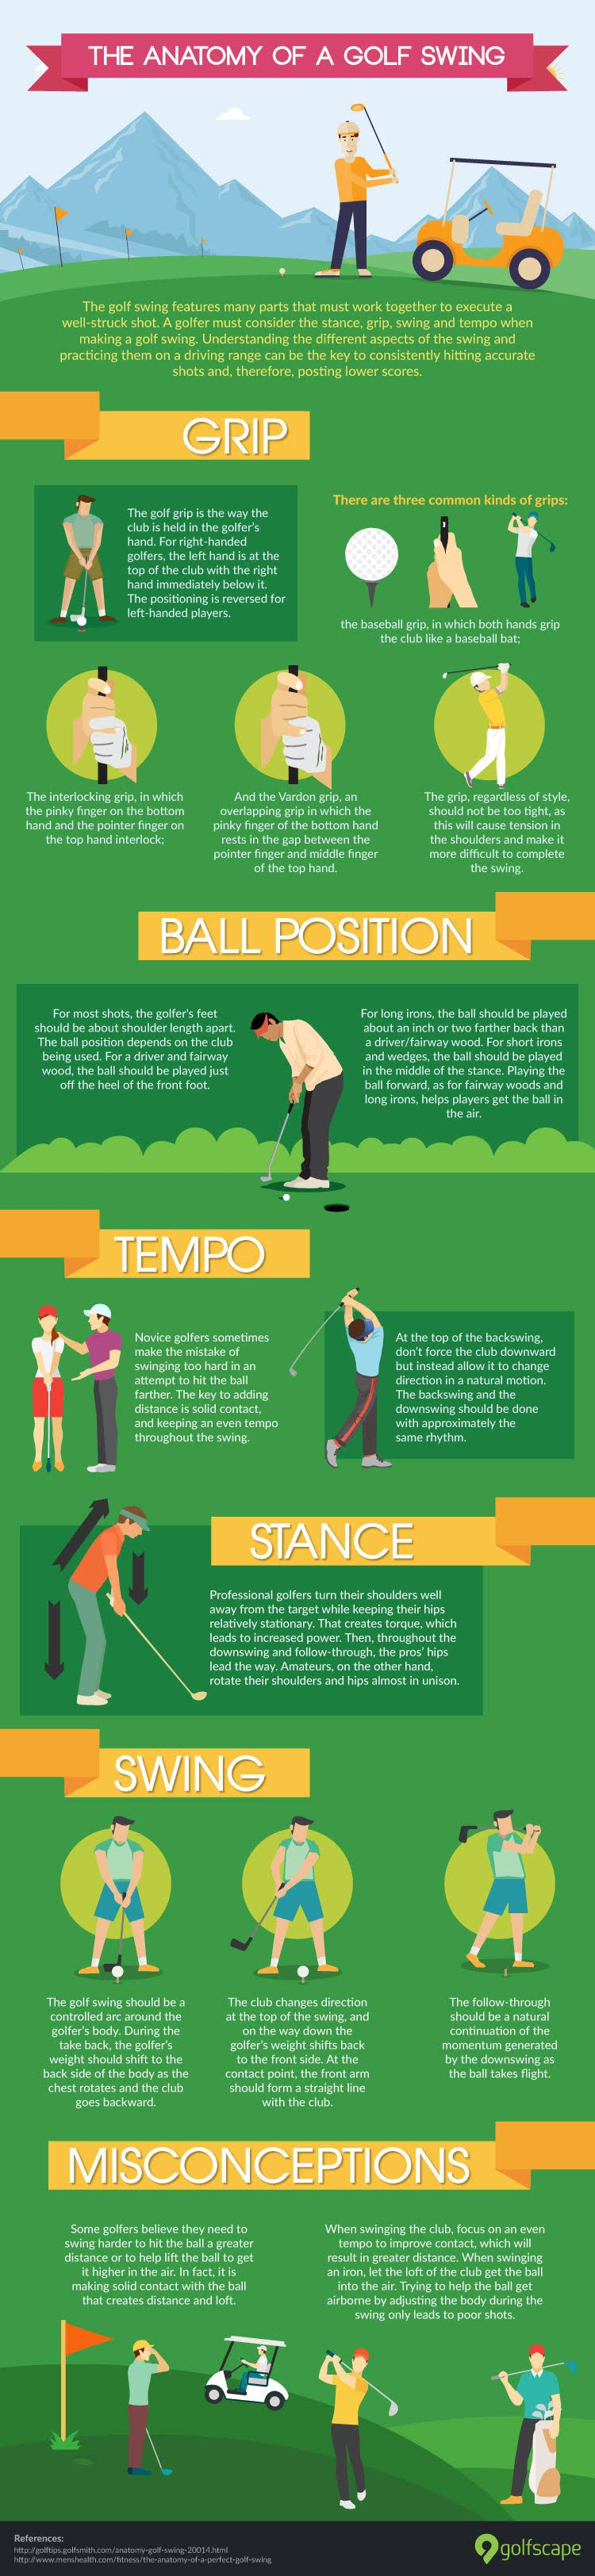 anatomy of a golf swing graphic | Golf | Pinterest